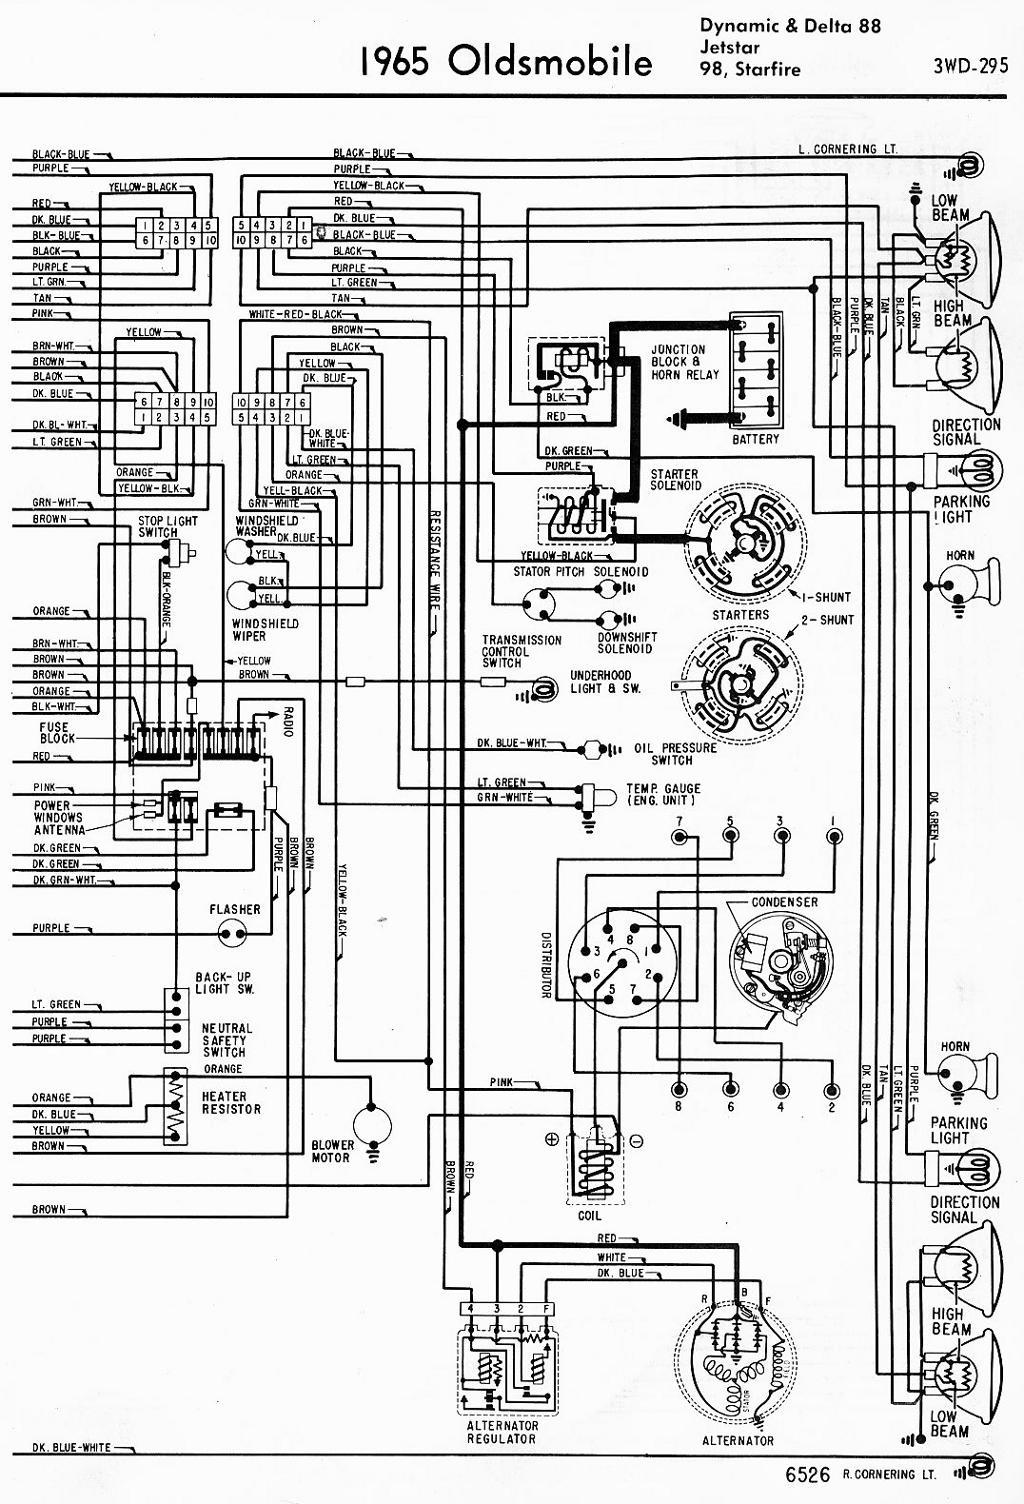 nissan tiida air con wiring diagram wiring schematic 1987 nissan pickup wiring diagram nissan tiida a c [ 1024 x 1504 Pixel ]